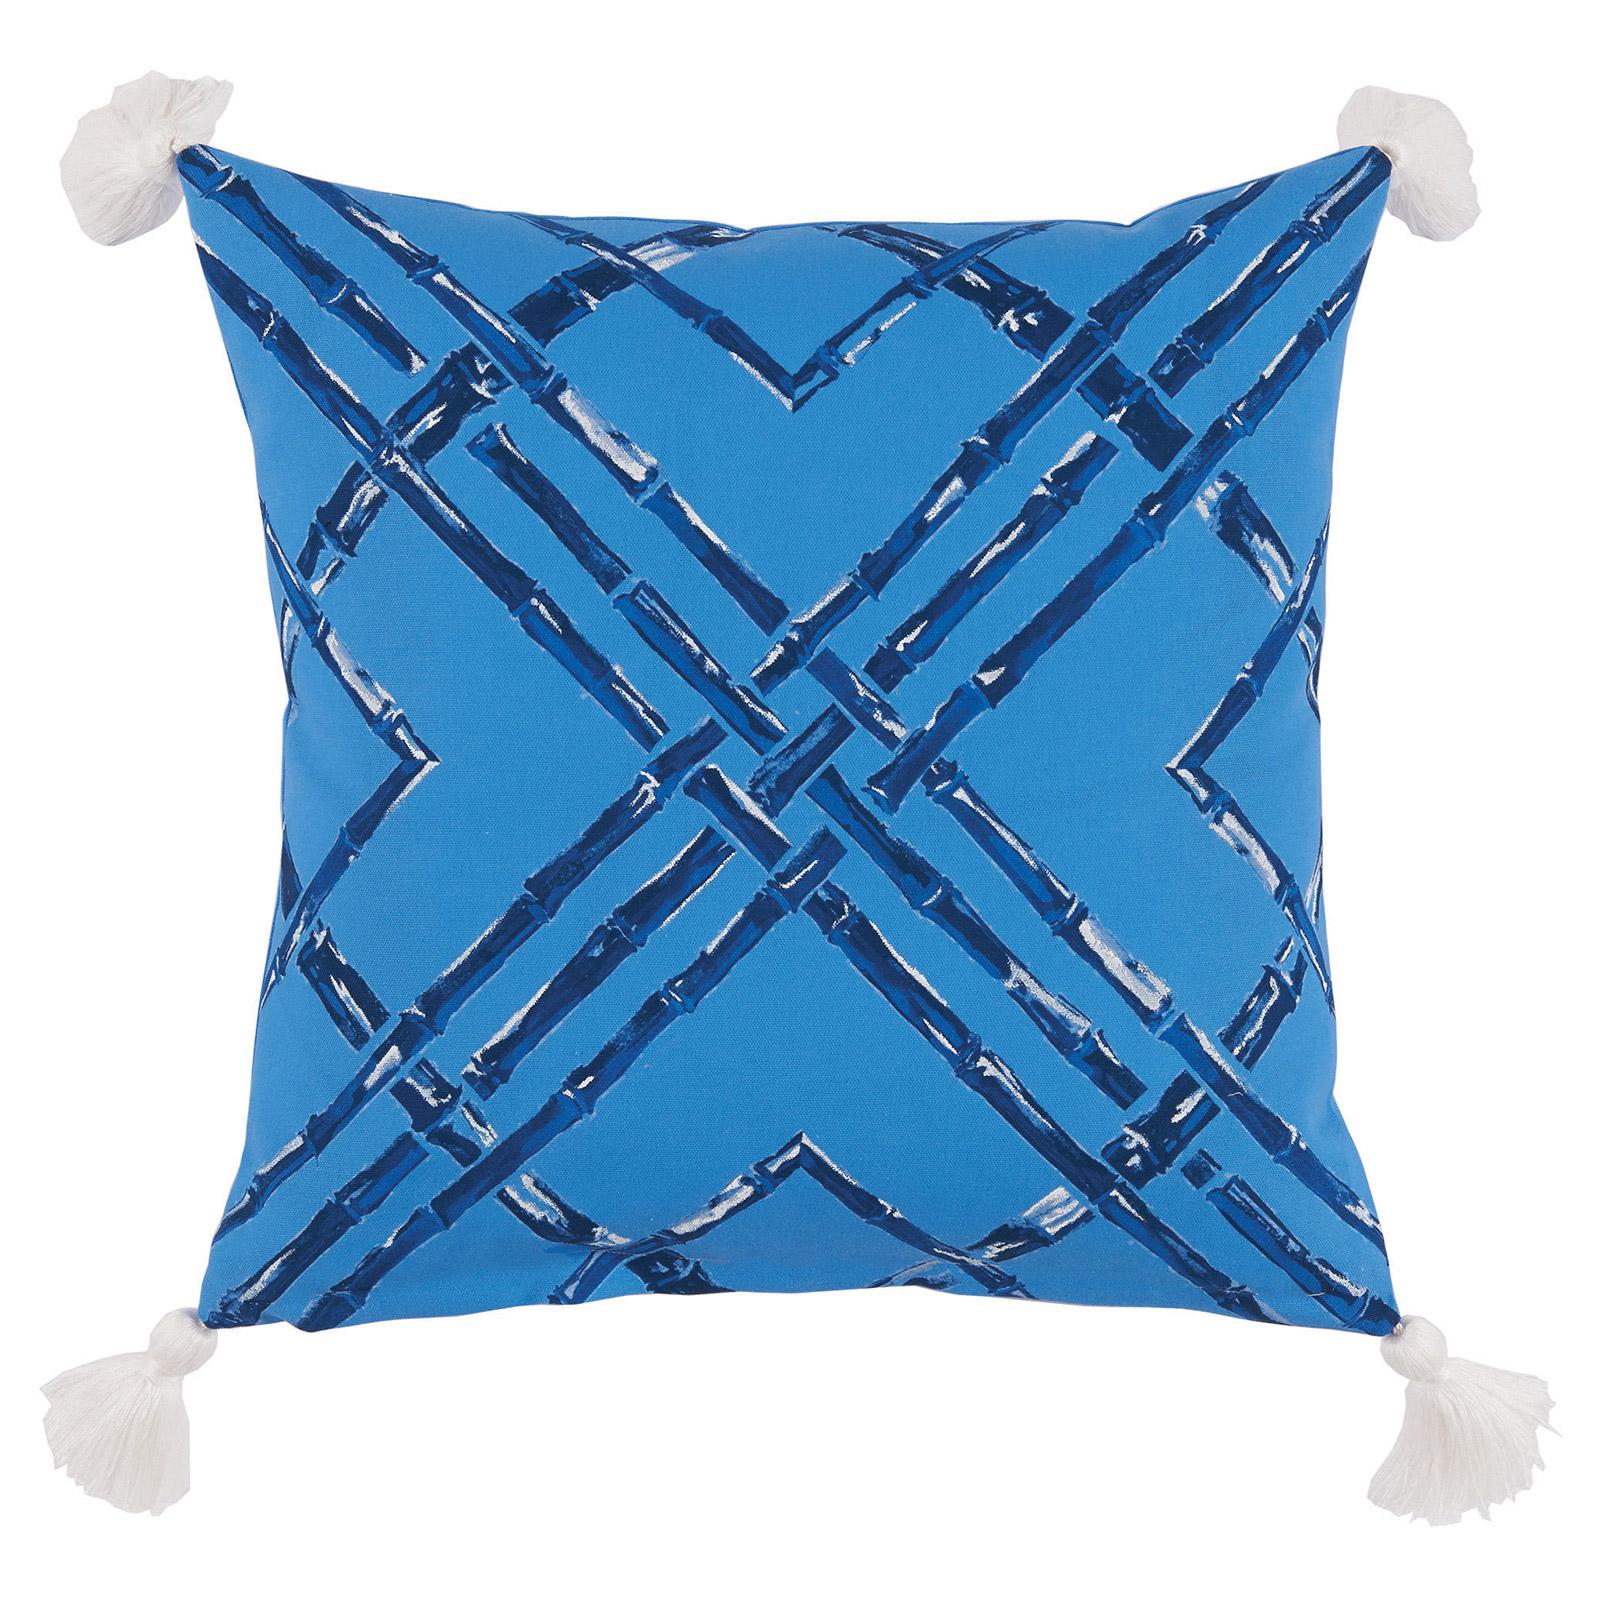 Mumbi Bazaar Bright Blue Bamboo Tassel Outdoor Pillow - 20x20